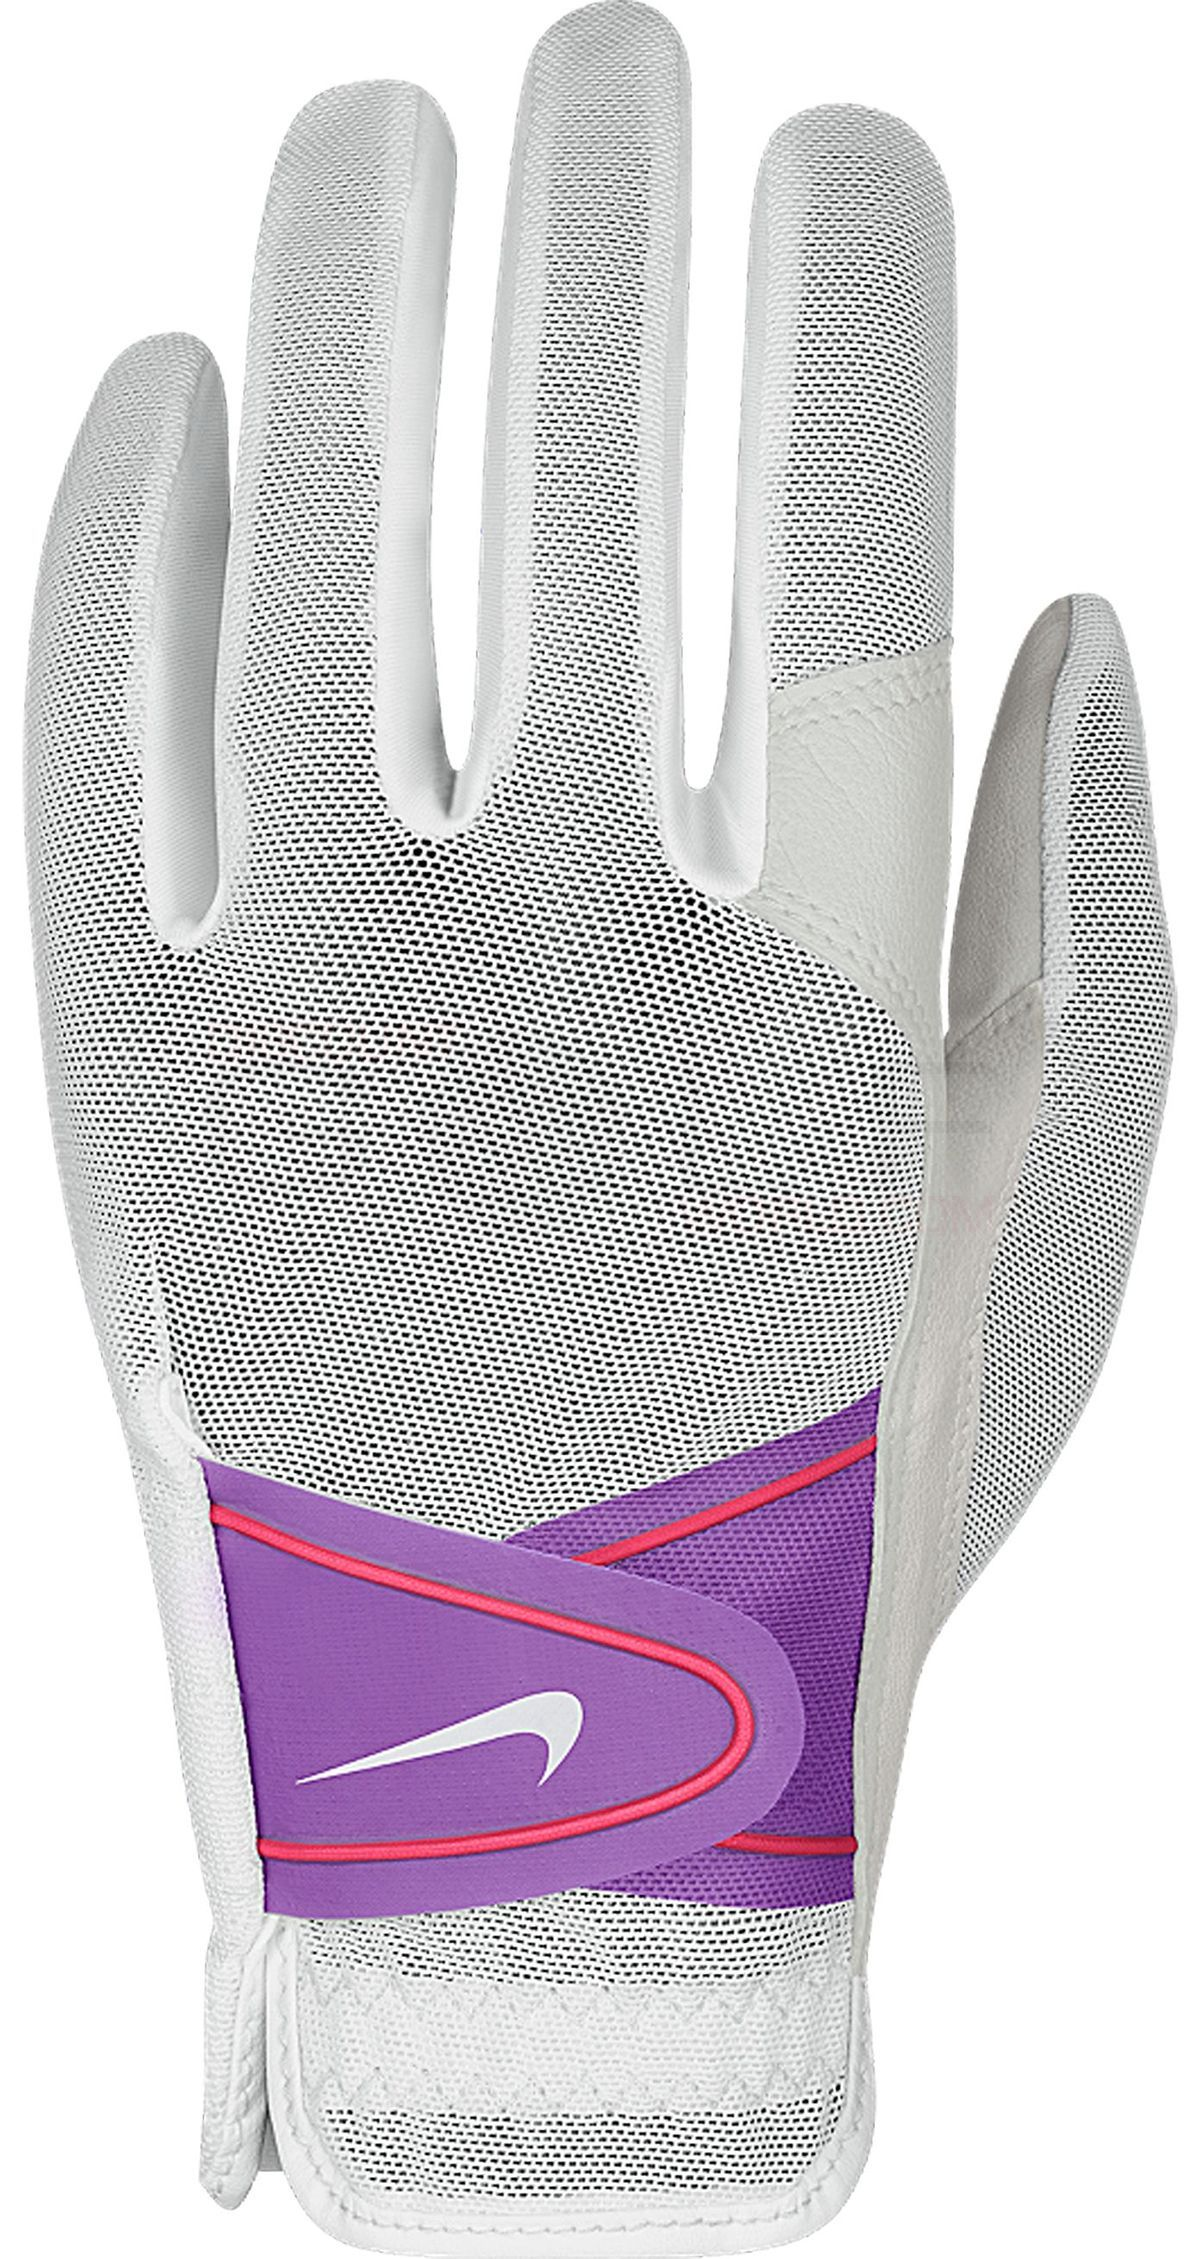 new products 33168 7b088 Nike Women s Summer Lite II Golf Glove Genuine Leather, Superior Fit,  Enhanced Feel Gloves Equipment -  11.19